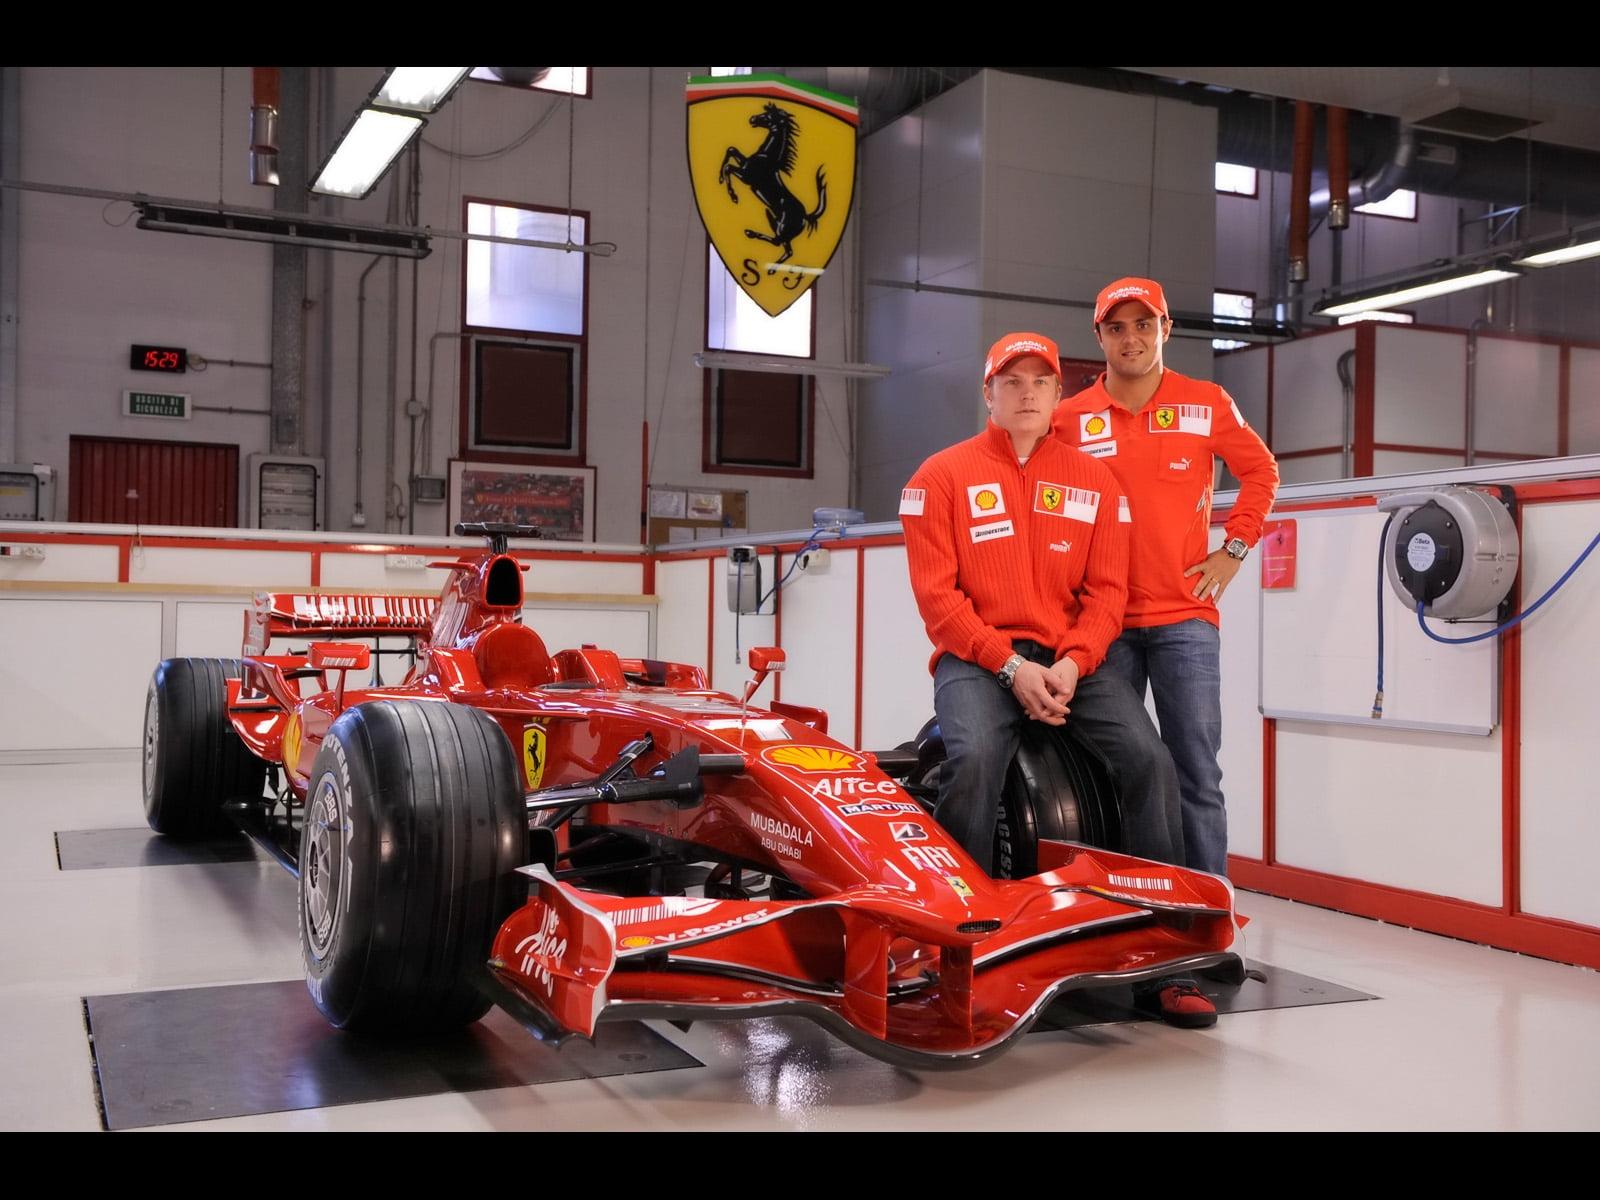 Red Go Kart With Two Men Standing Beside Hd Wallpaper Kimi Raikkonen Scuderia Ferrari 1850157 Hd Wallpaper Backgrounds Download